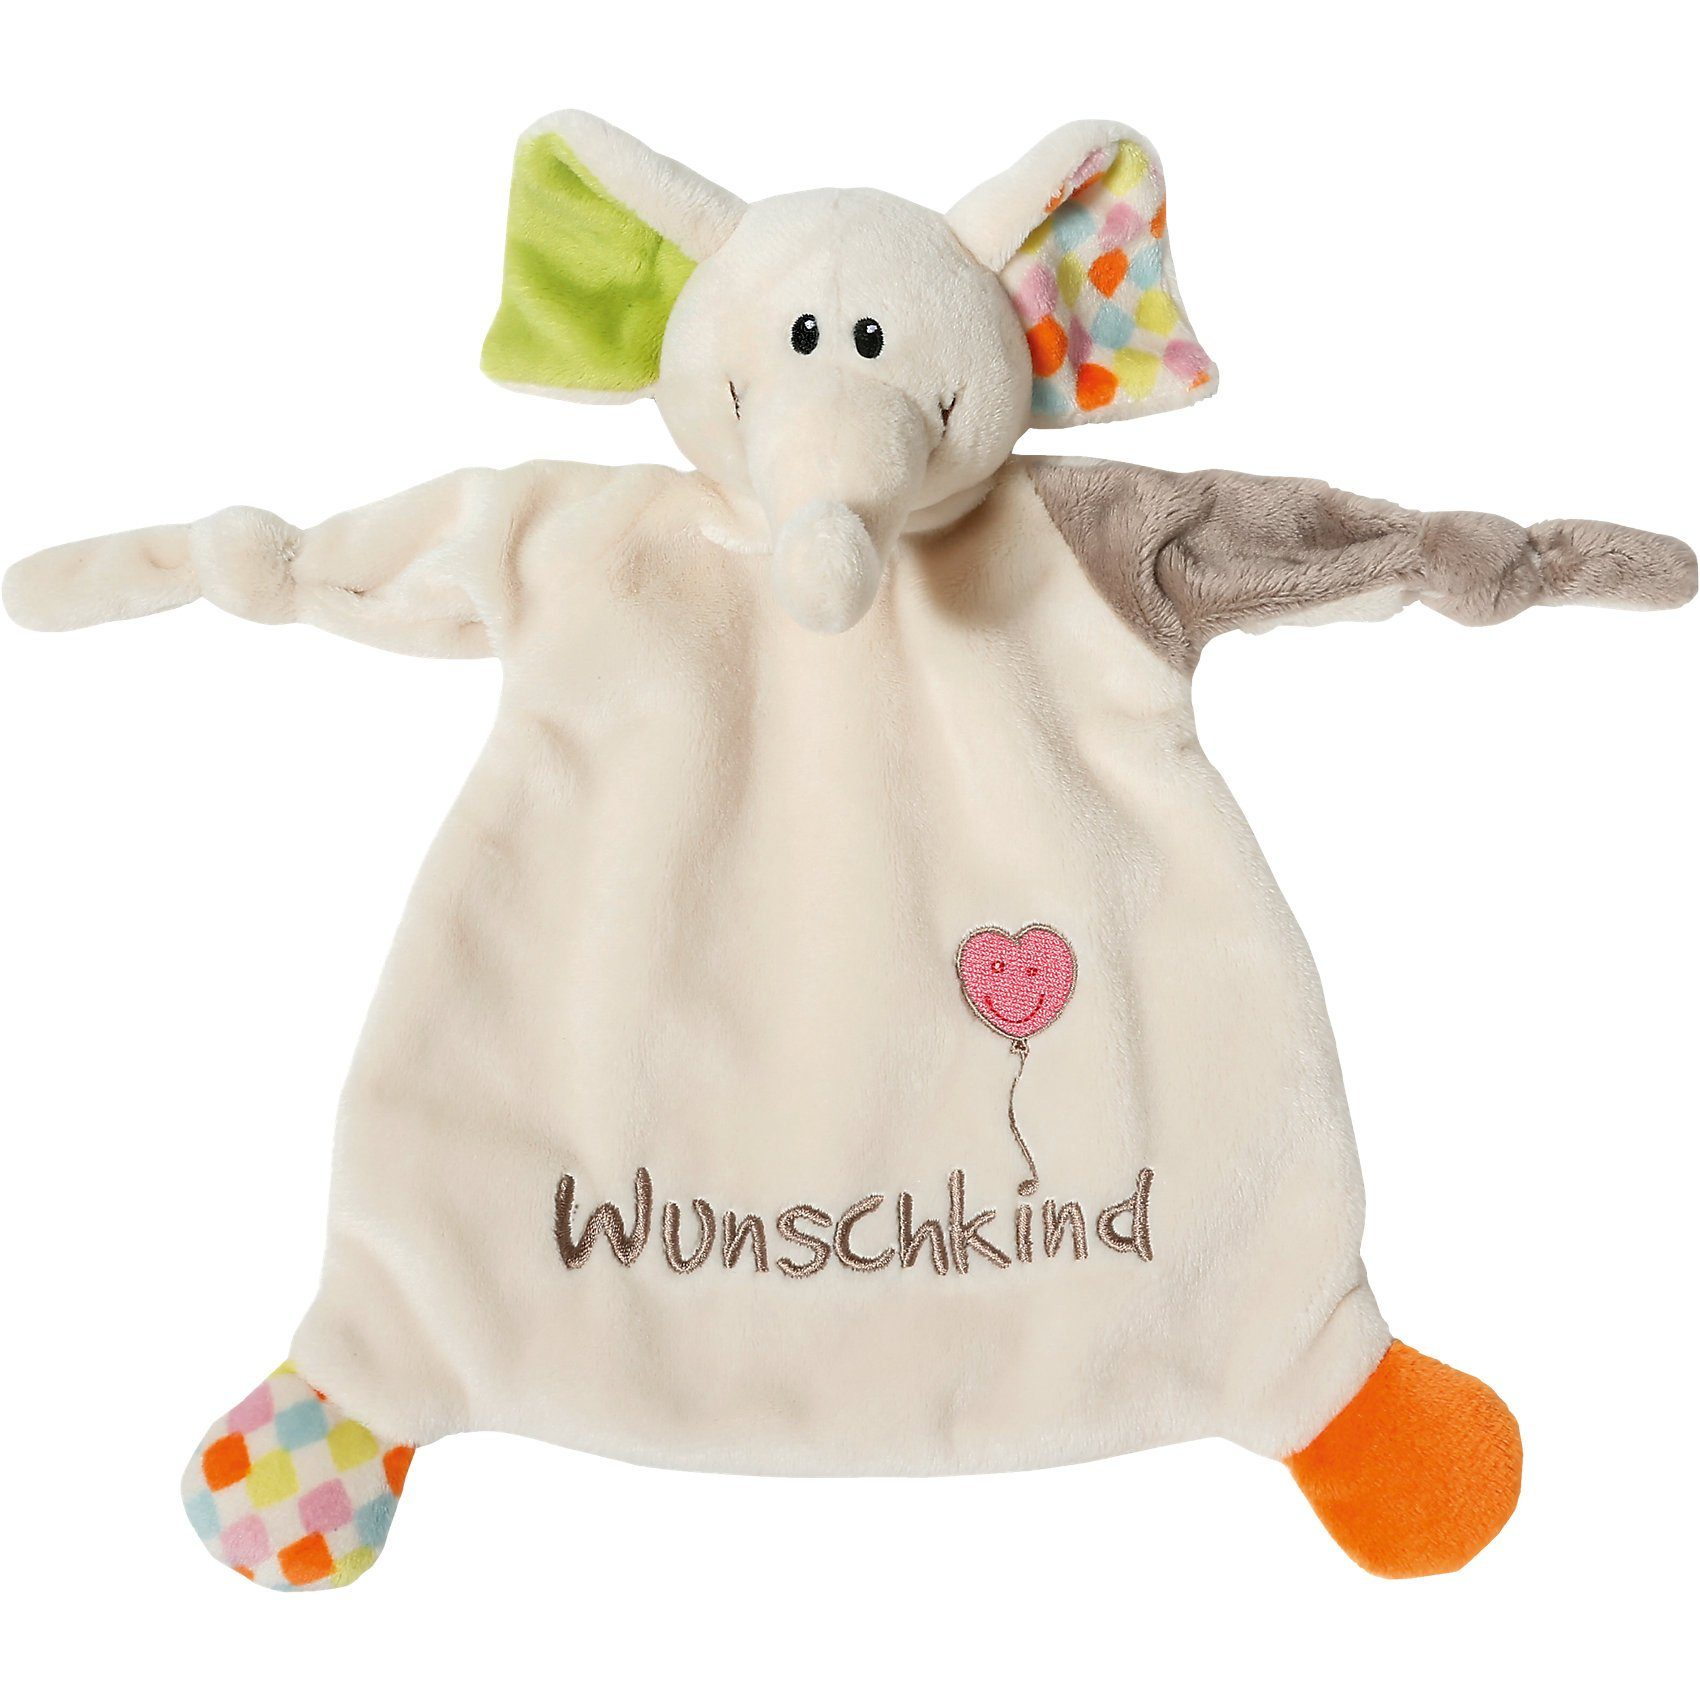 "Schmusetuch Elefant ""Wunschkind"" 25x25cm (40038)"